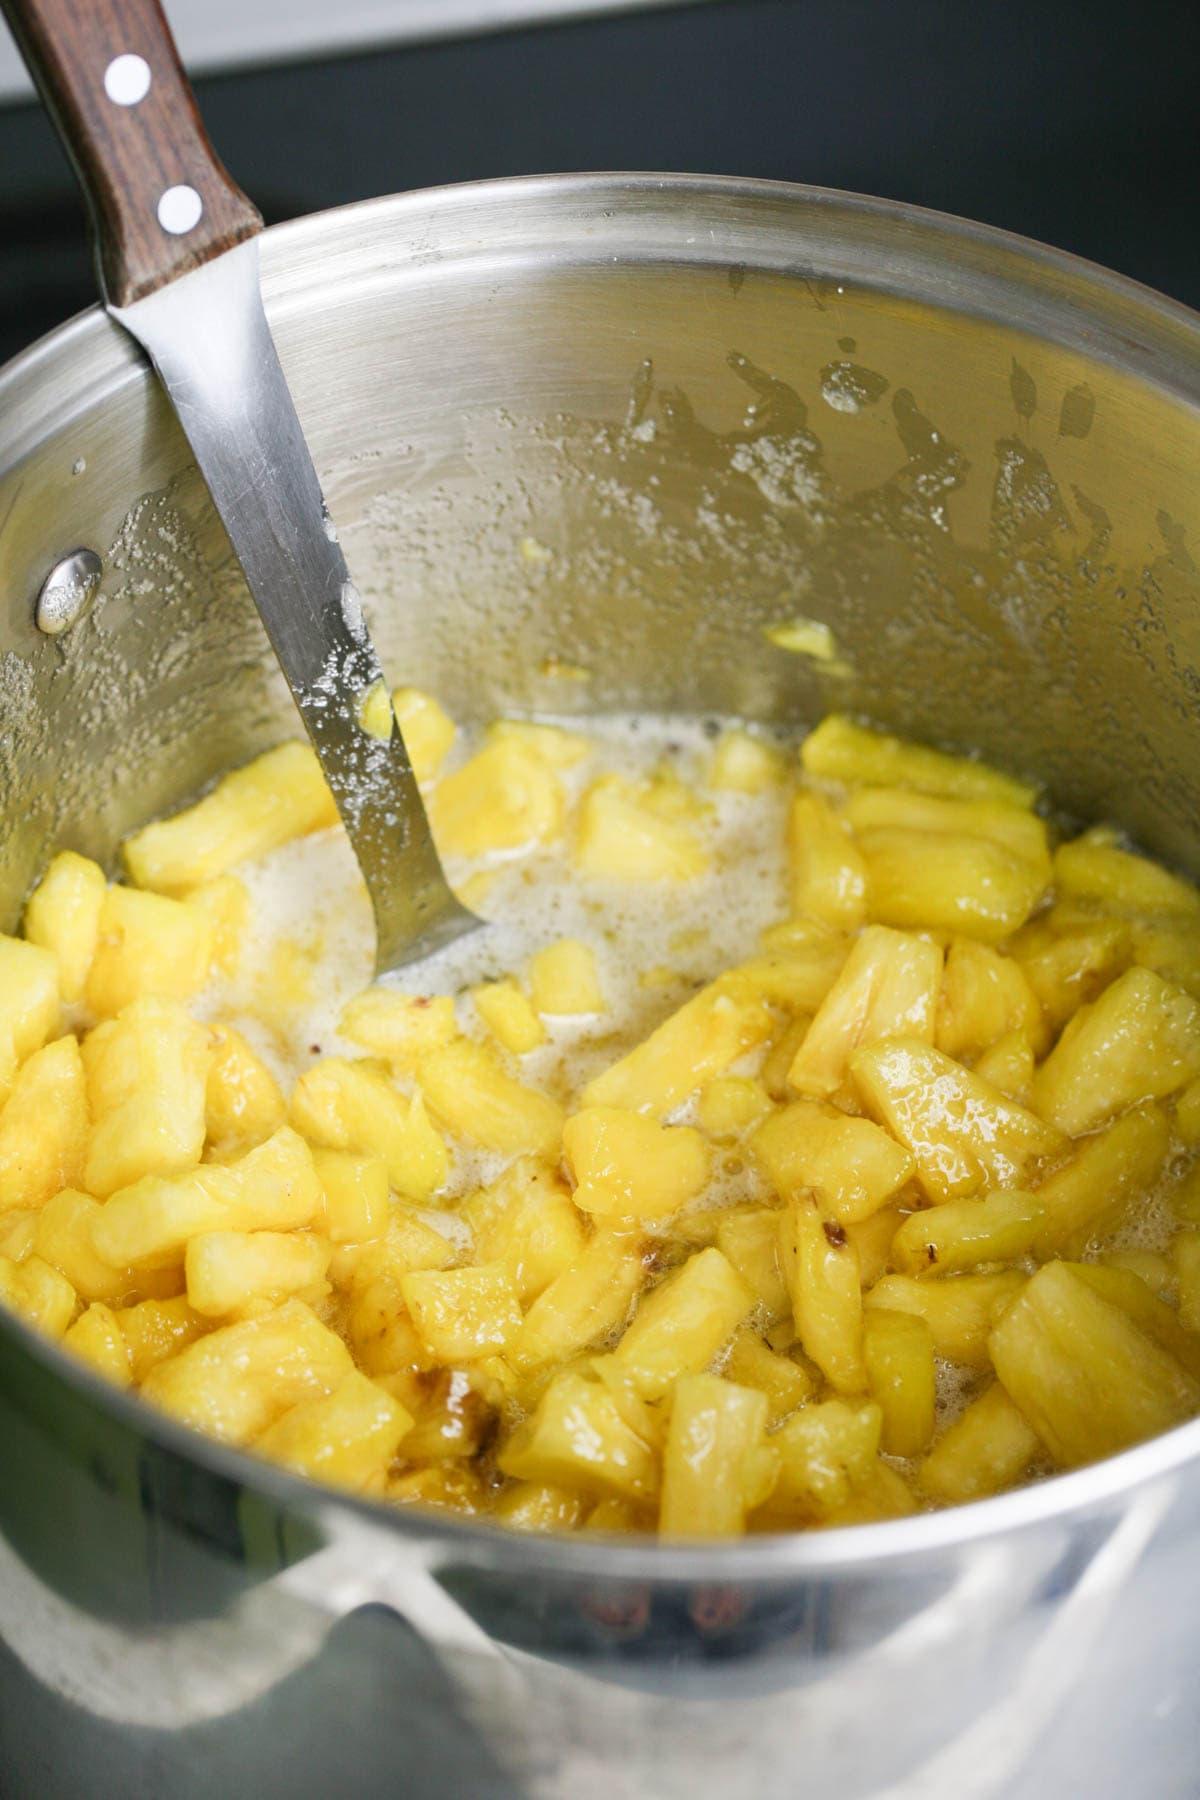 Stirring the jam.